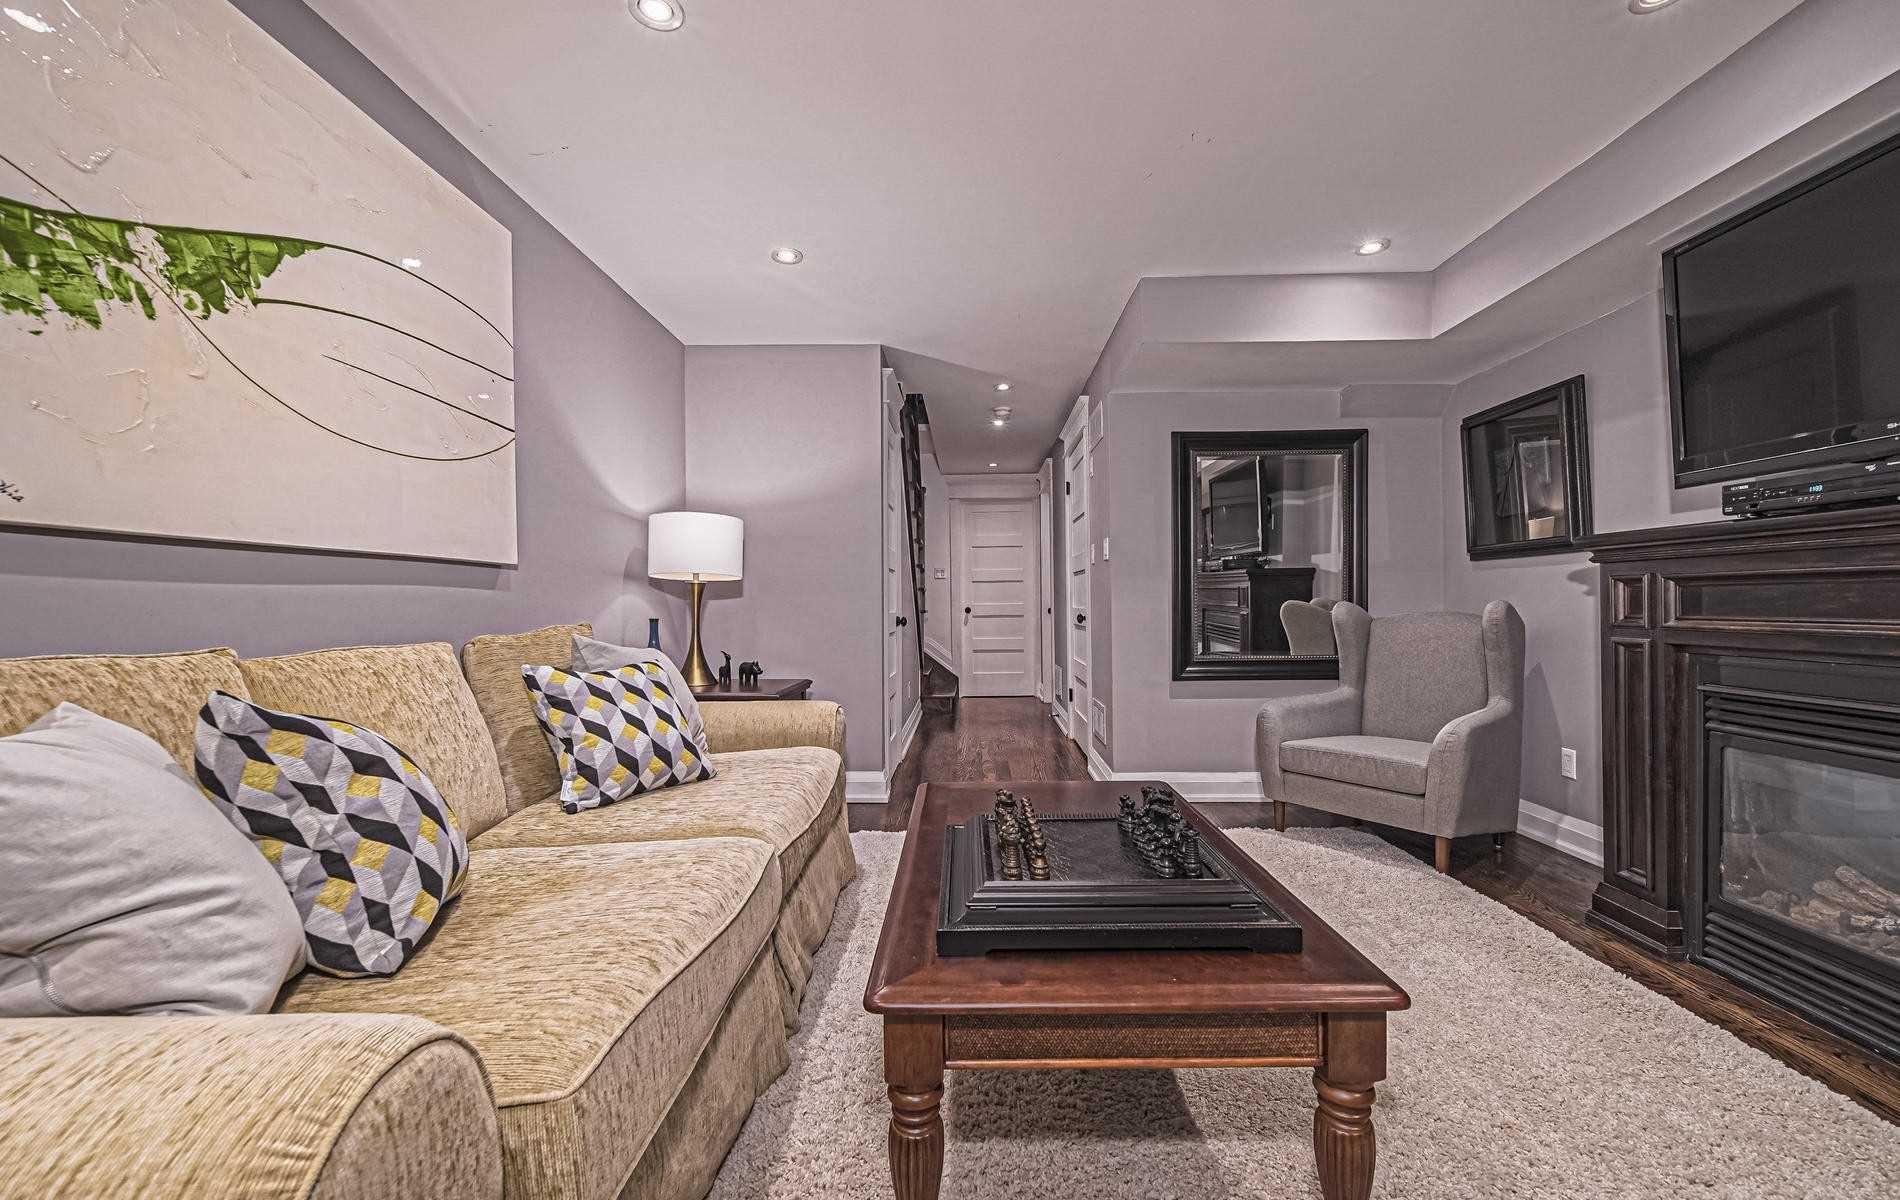 Photo 18: Photos: 216A Hamilton Street in Toronto: South Riverdale House (3-Storey) for sale (Toronto E01)  : MLS®# E4619870